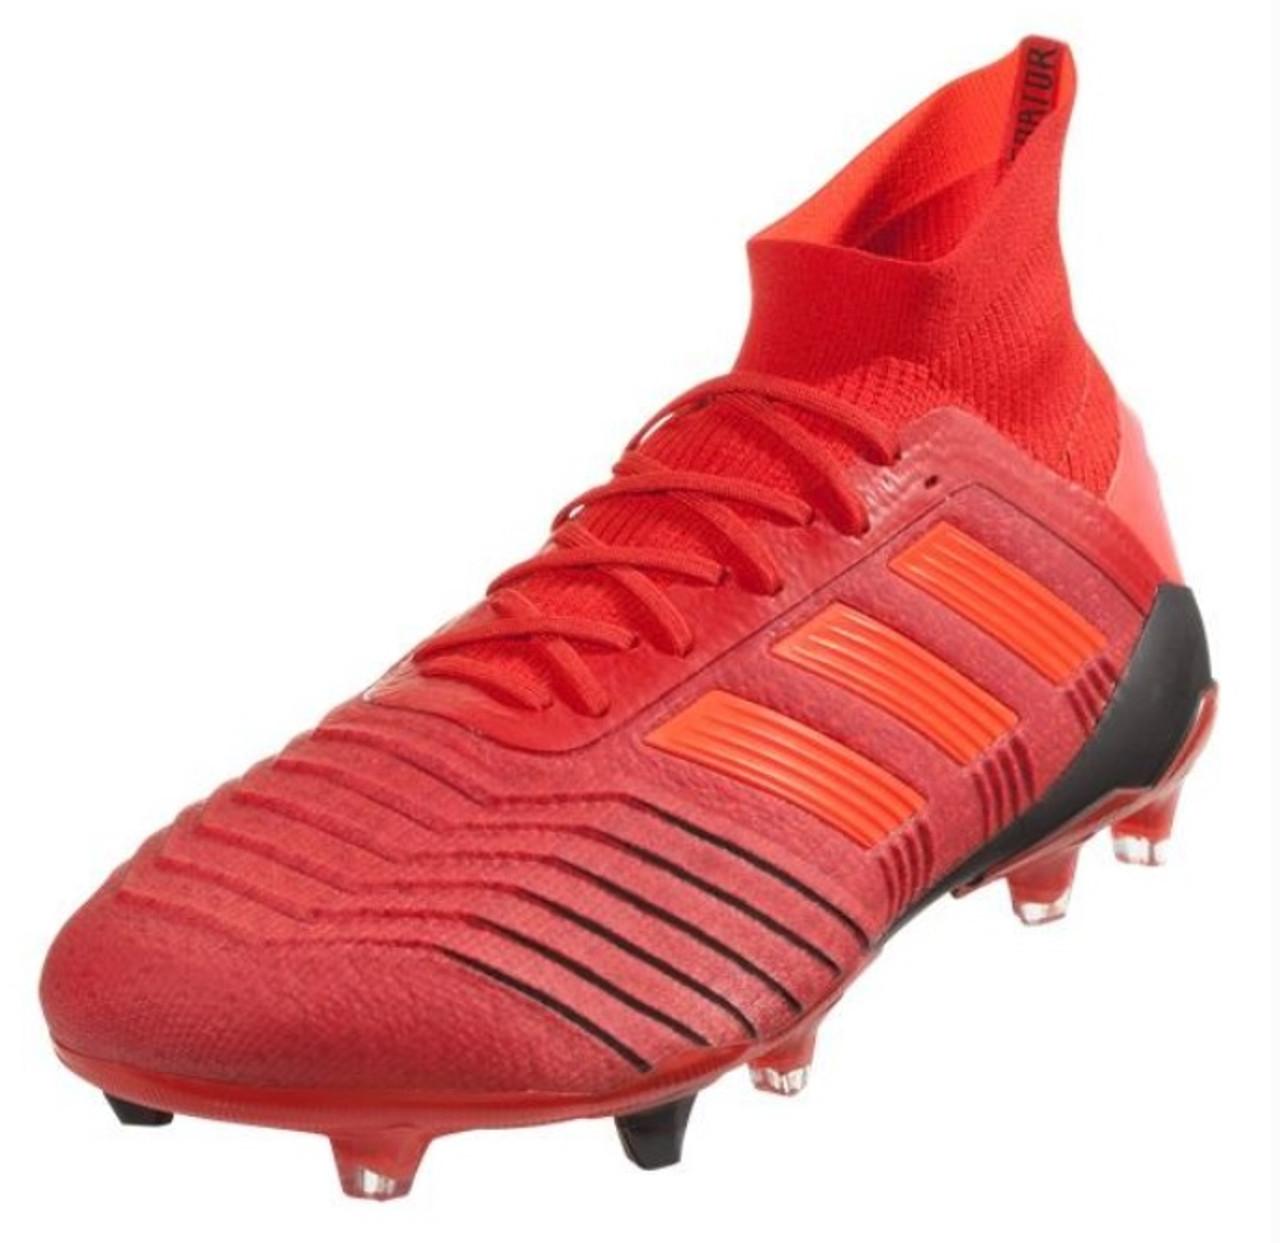 c5322bb14 Adidas Predator 19.1 FG - Active Red Solar Red Core Black (111918) - ohp  soccer